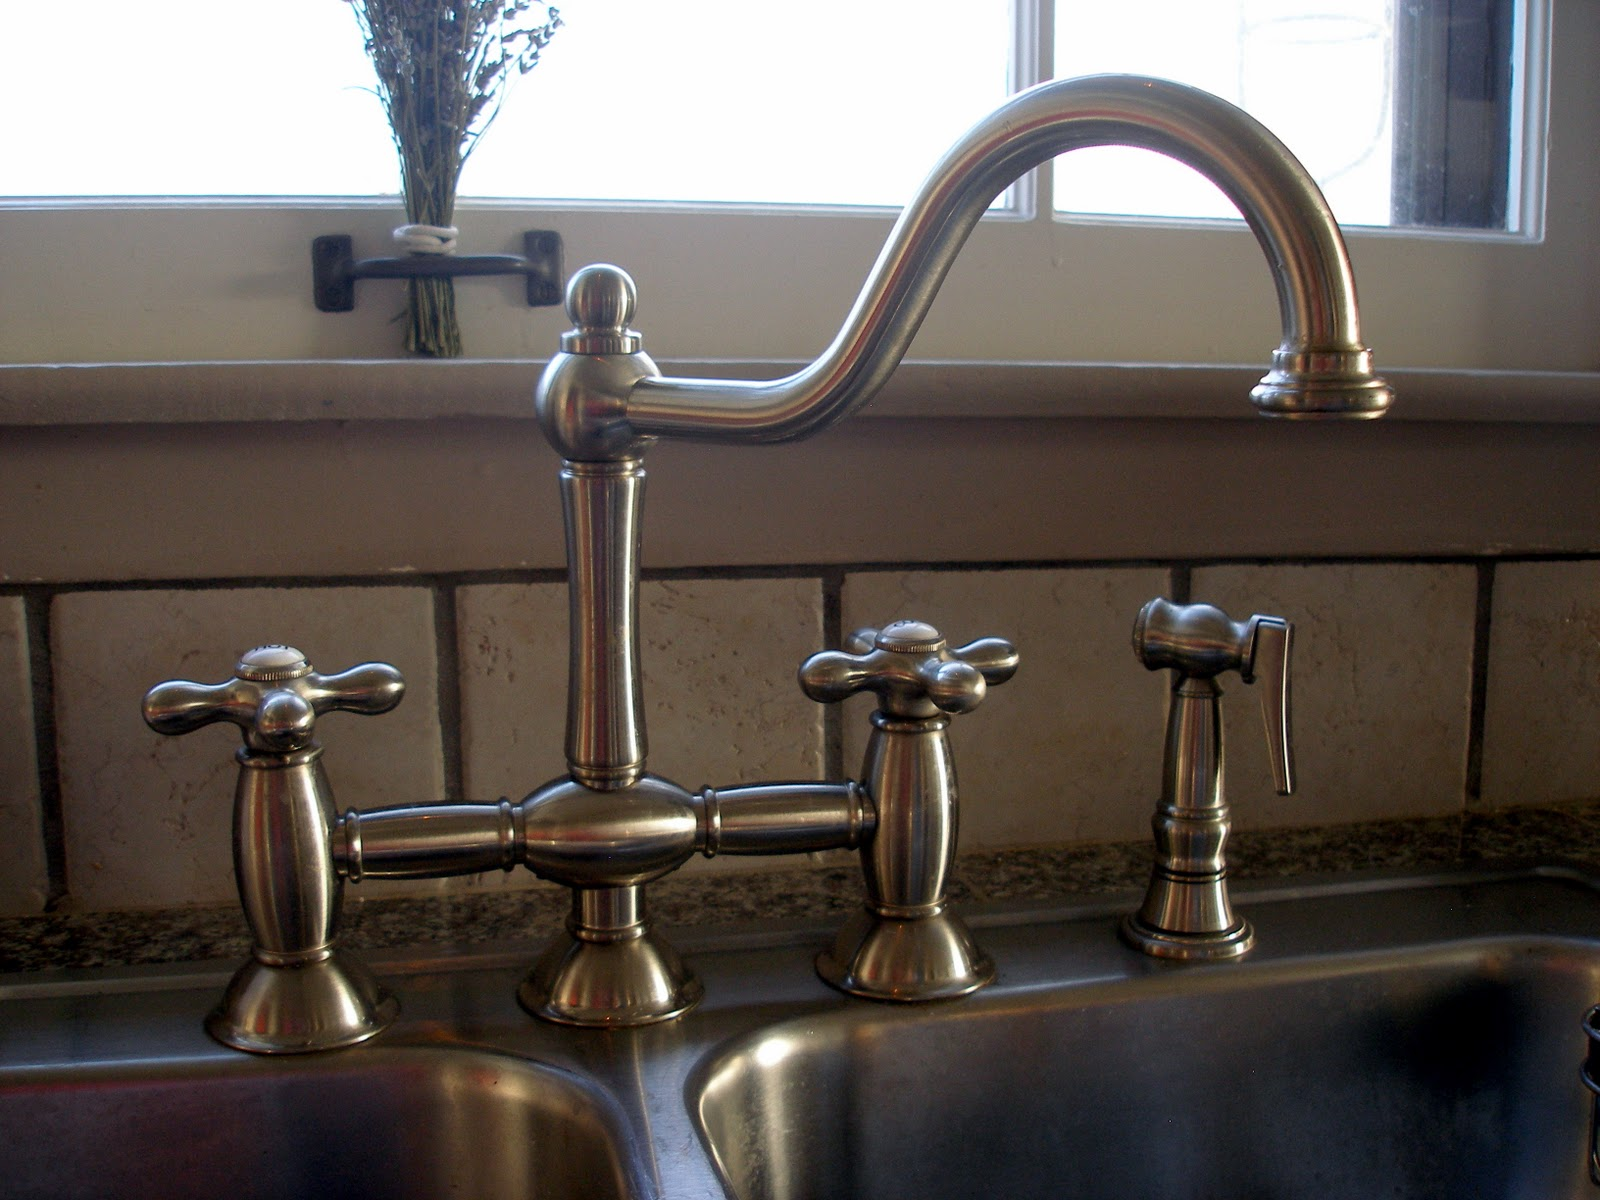 Bridge Faucets for Vintage Bathroom Sinks